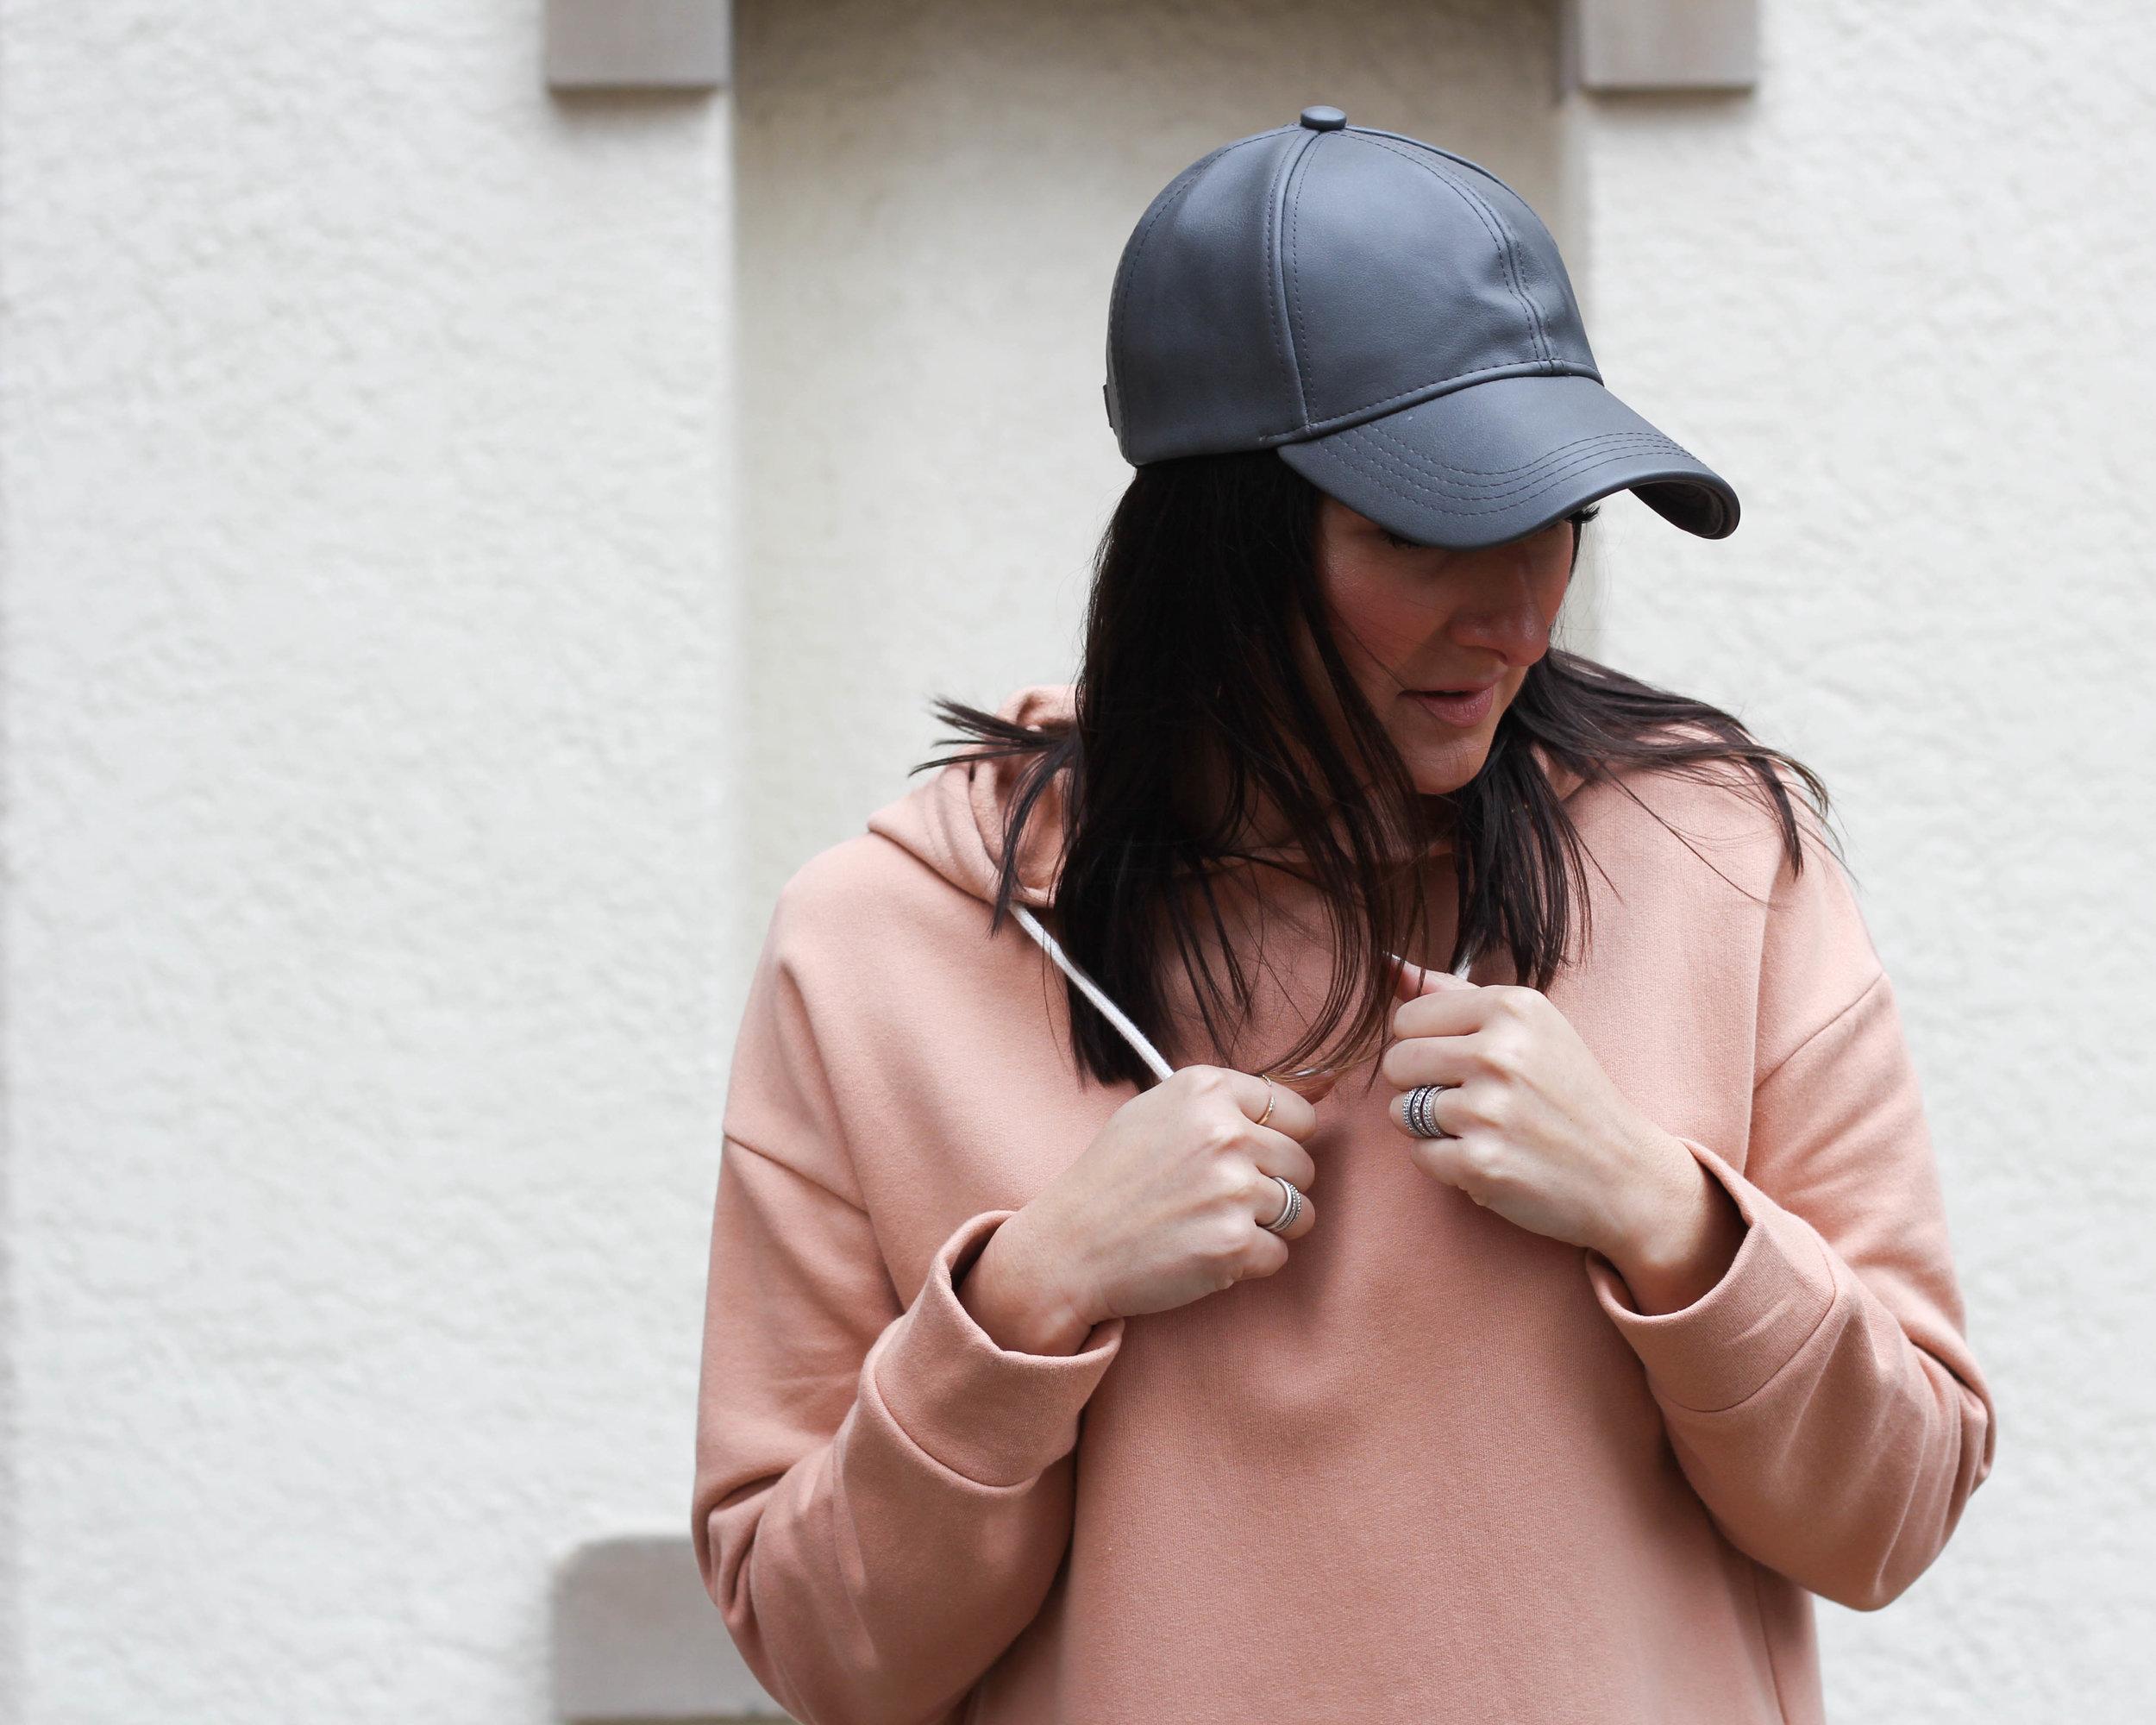 Sanems - Sweatshirt Dress Trend - 14.jpg